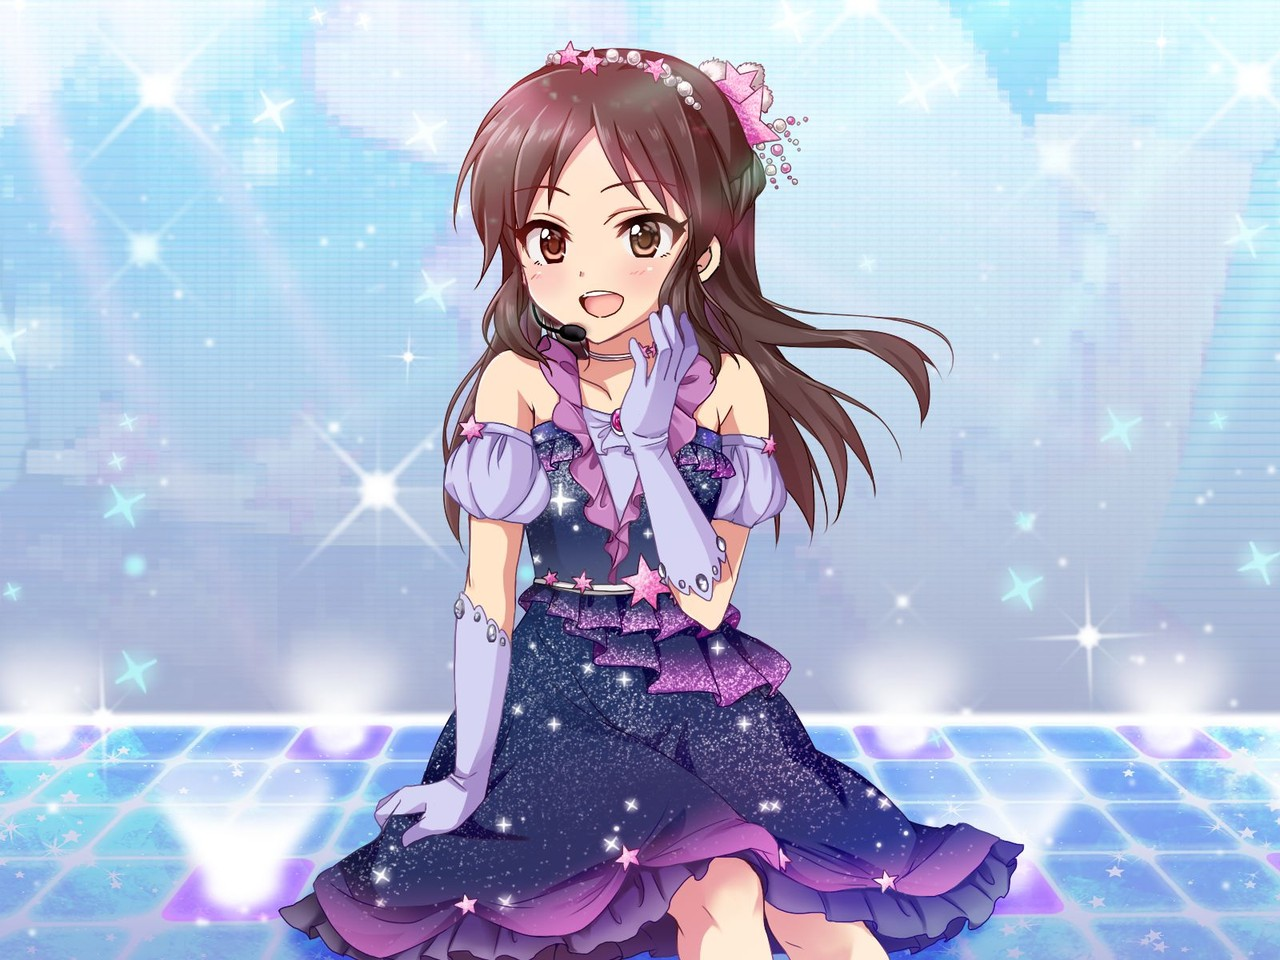 tachibana_arisu169